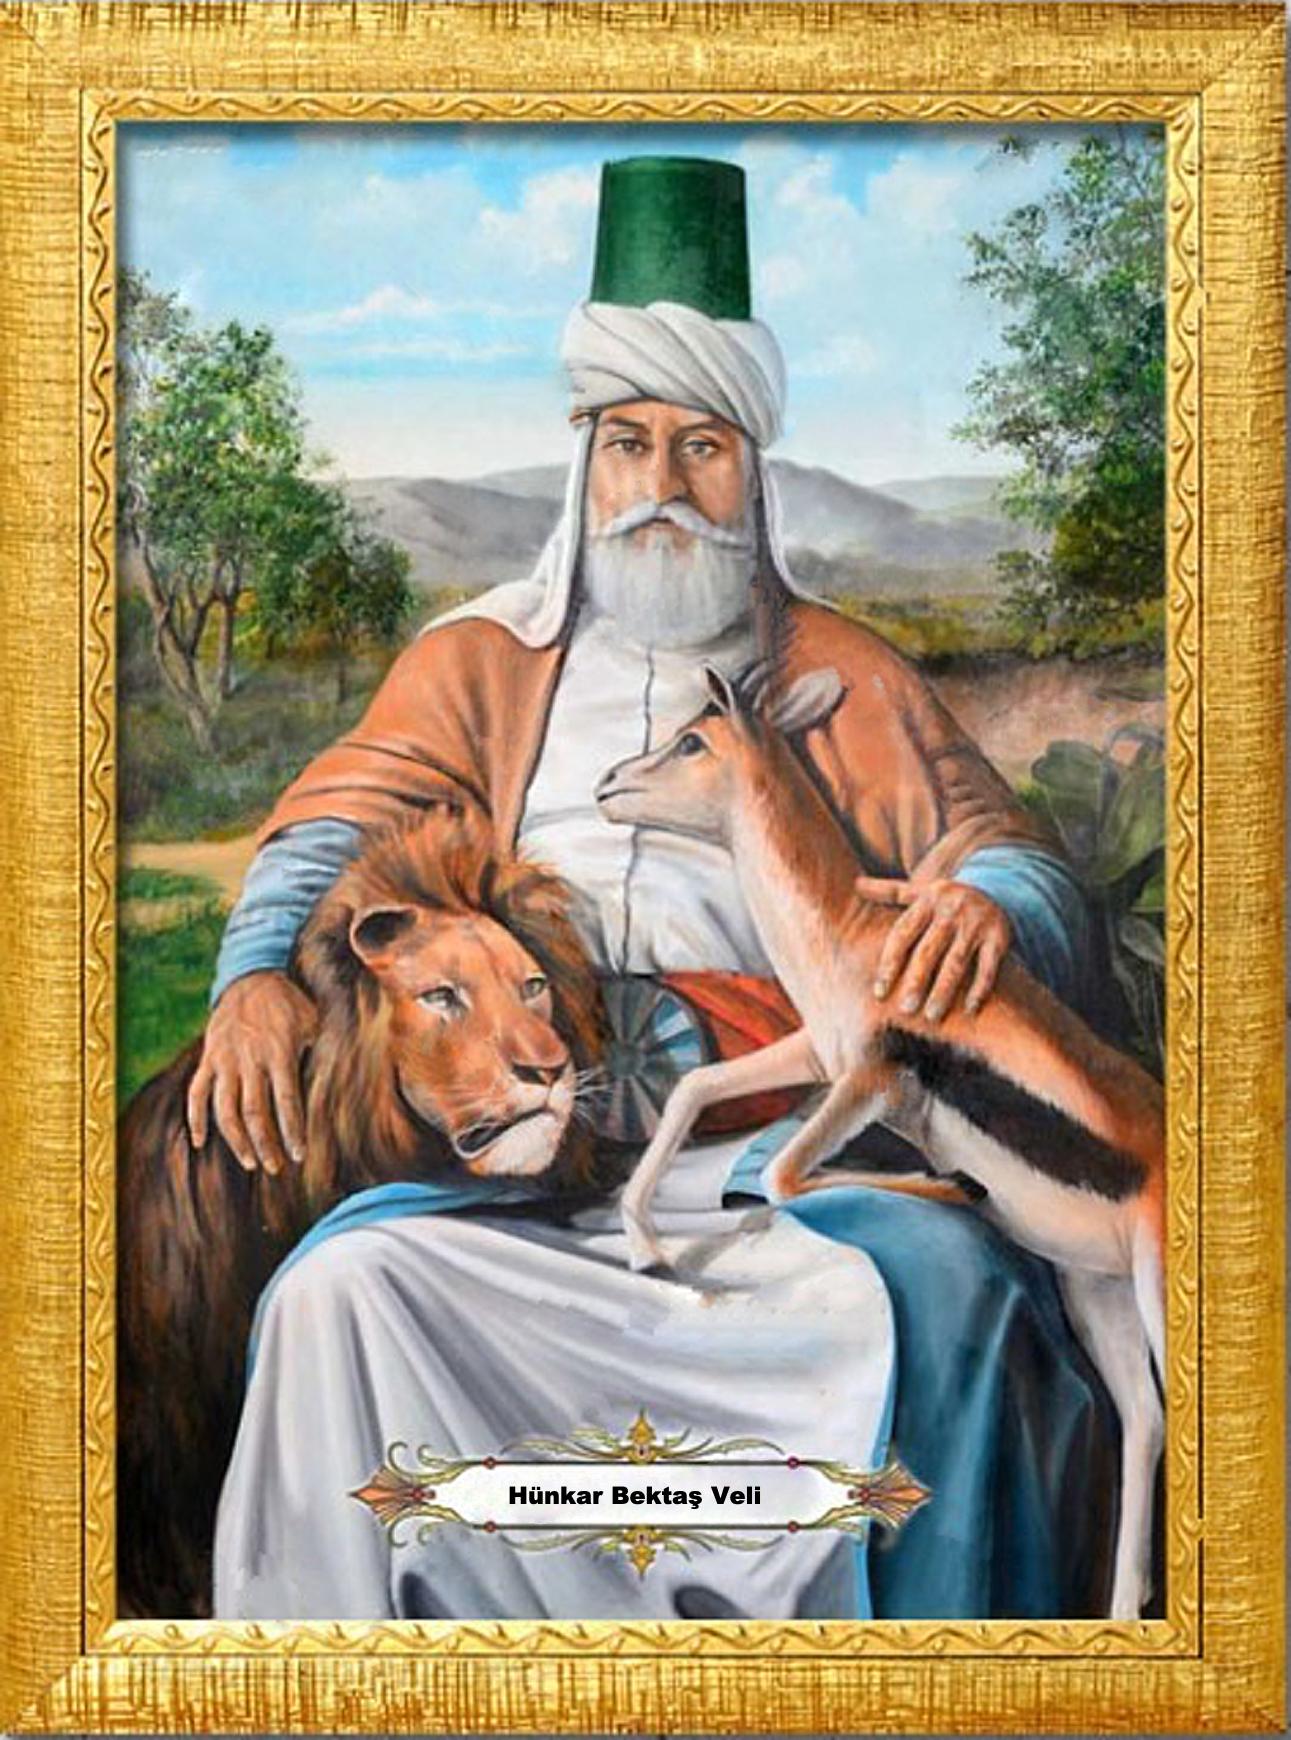 16-Hace-Bekstah-Veli-Alevi-Bektashi-DAB-Revolutionære-Alevi-Forbund-1